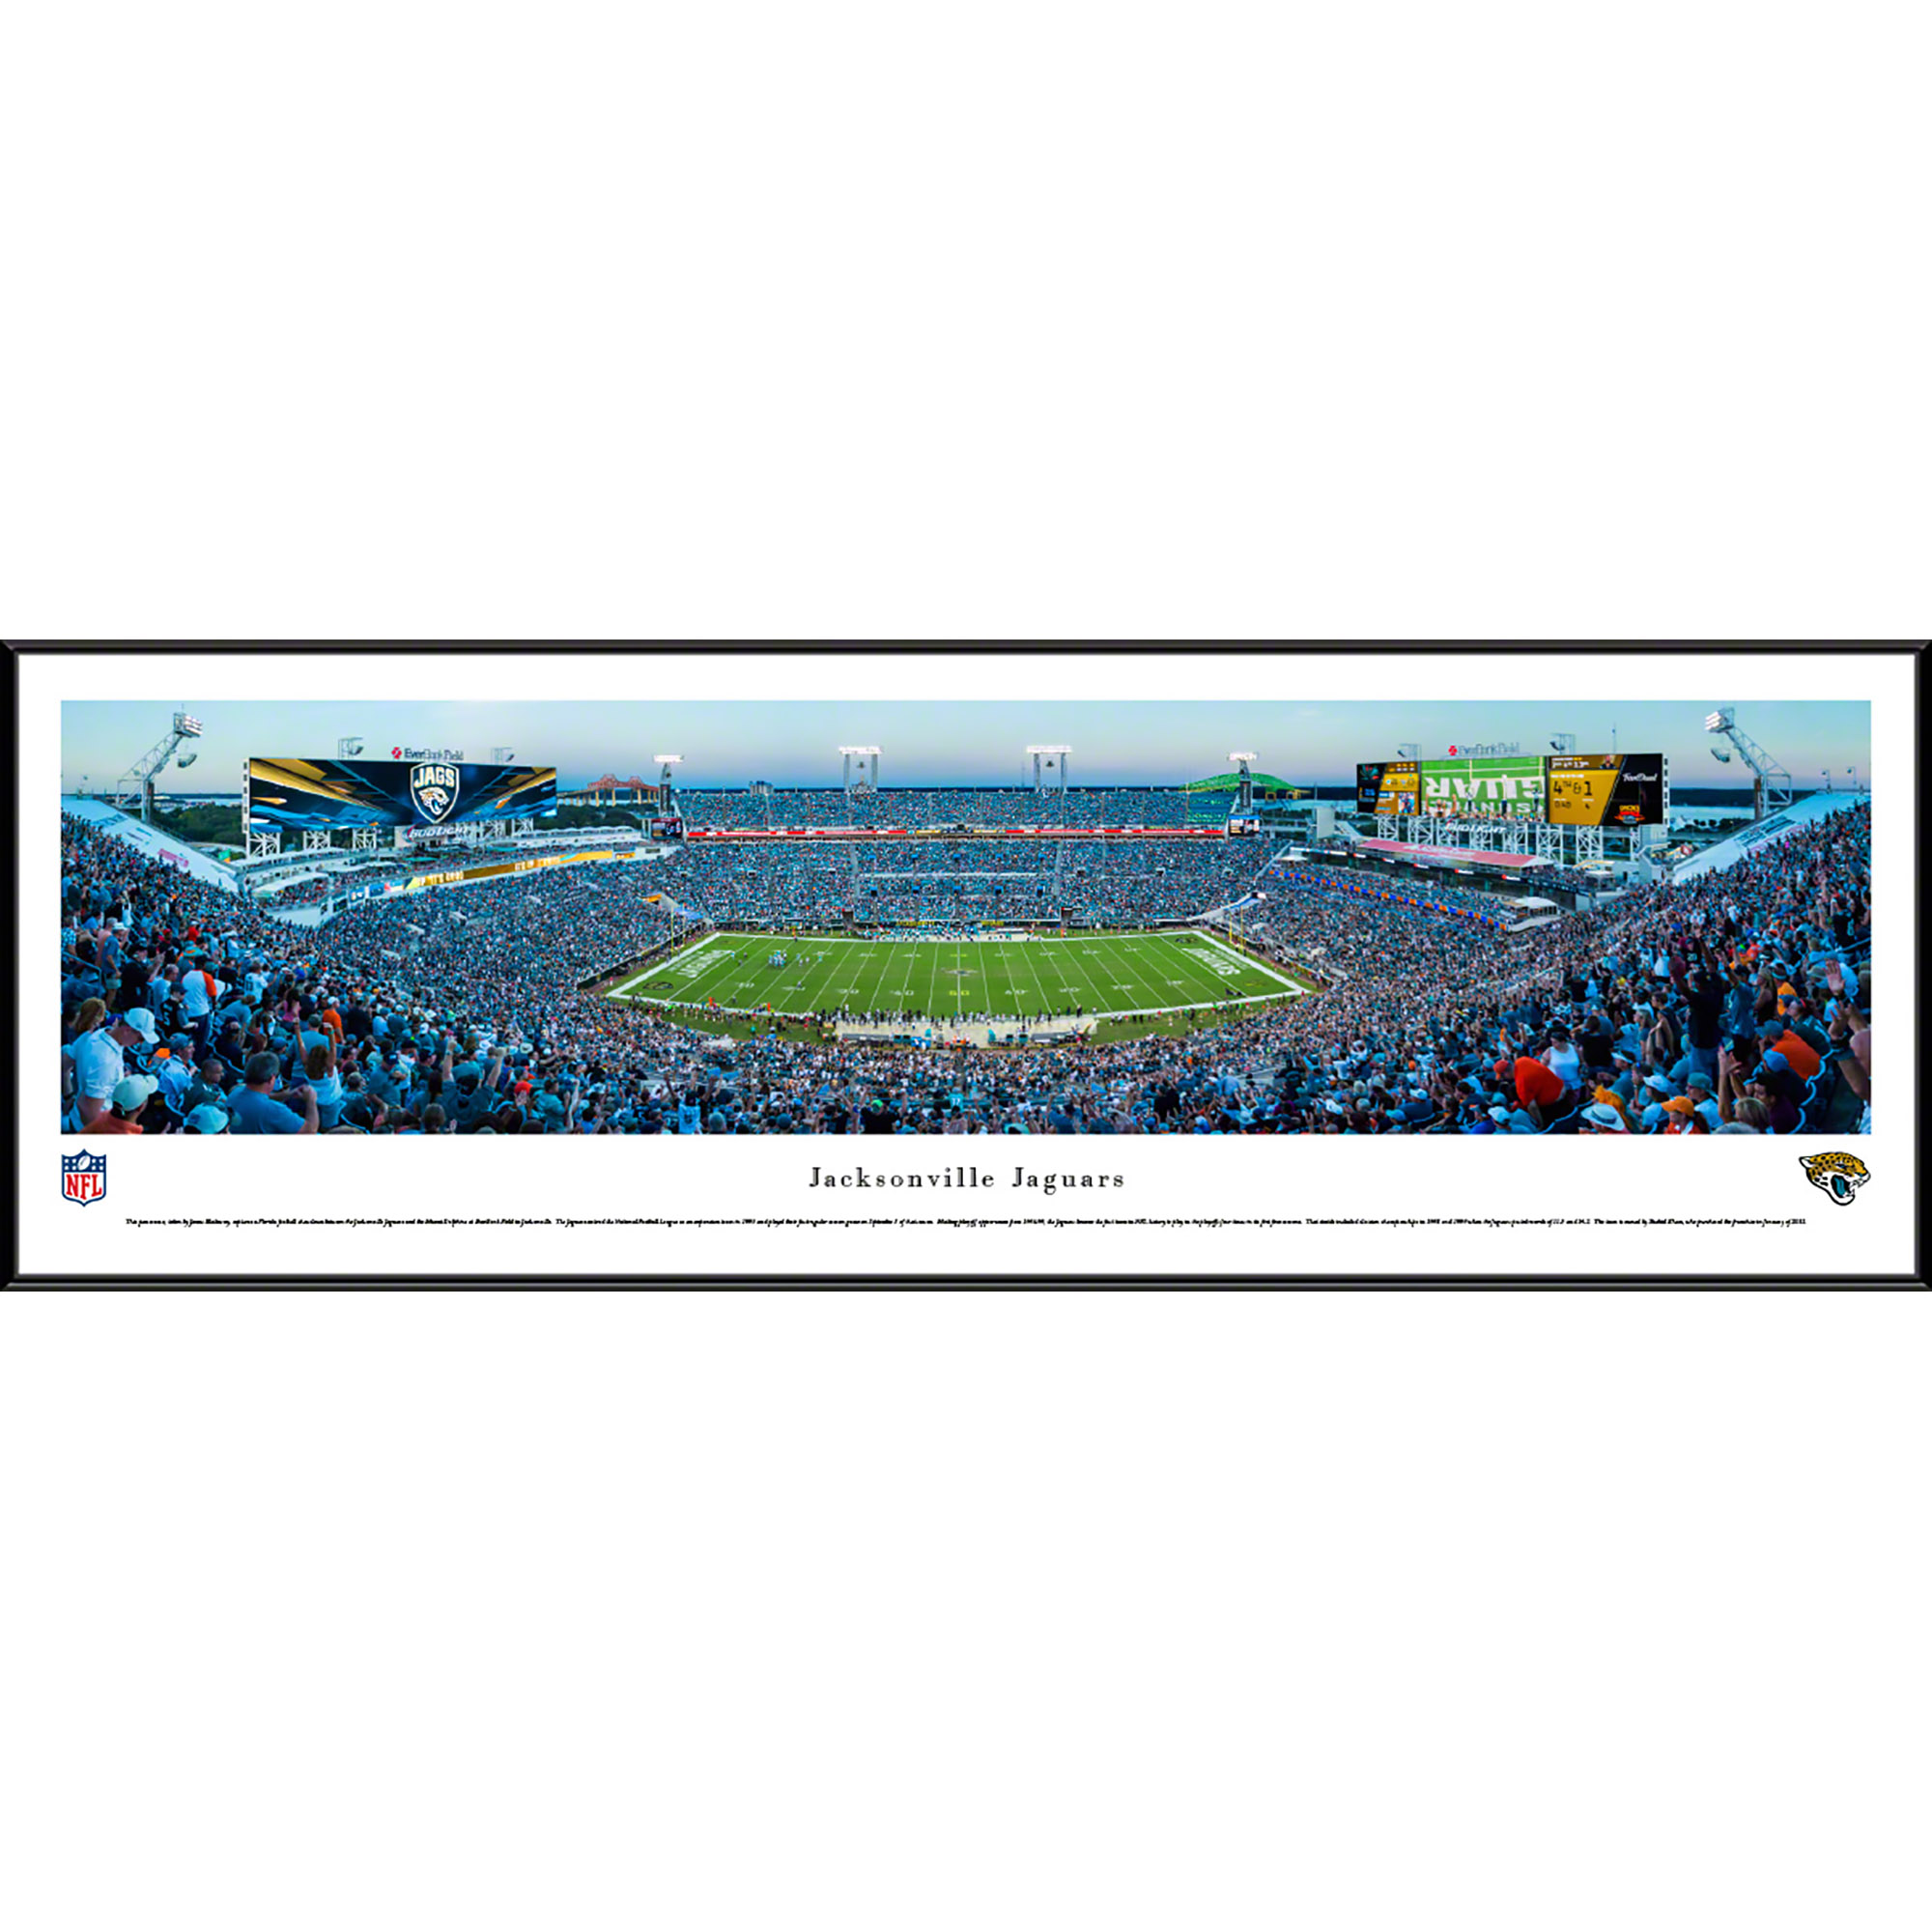 Jacksonville Jaguars 50 Yard Line At Everbank Field Blakeway Panoramas Nfl Print With Standard Frame Walmart Com Walmart Com